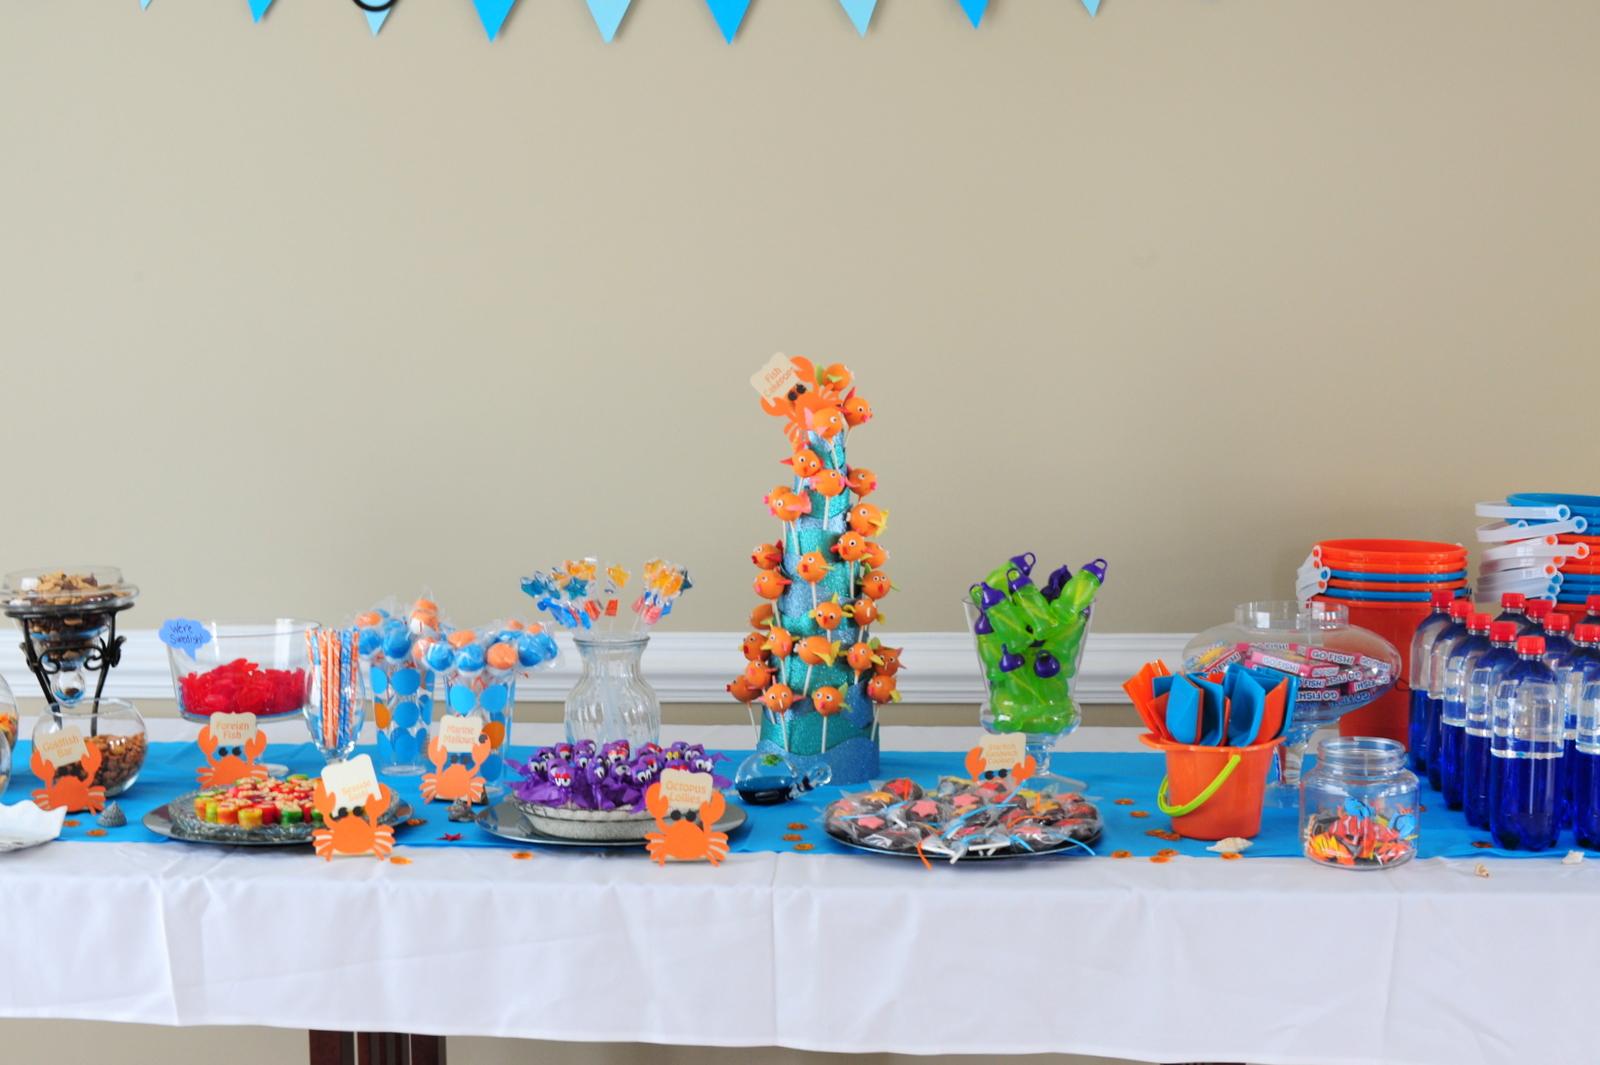 Ocean Party Decoration Ideas | Flisol Home